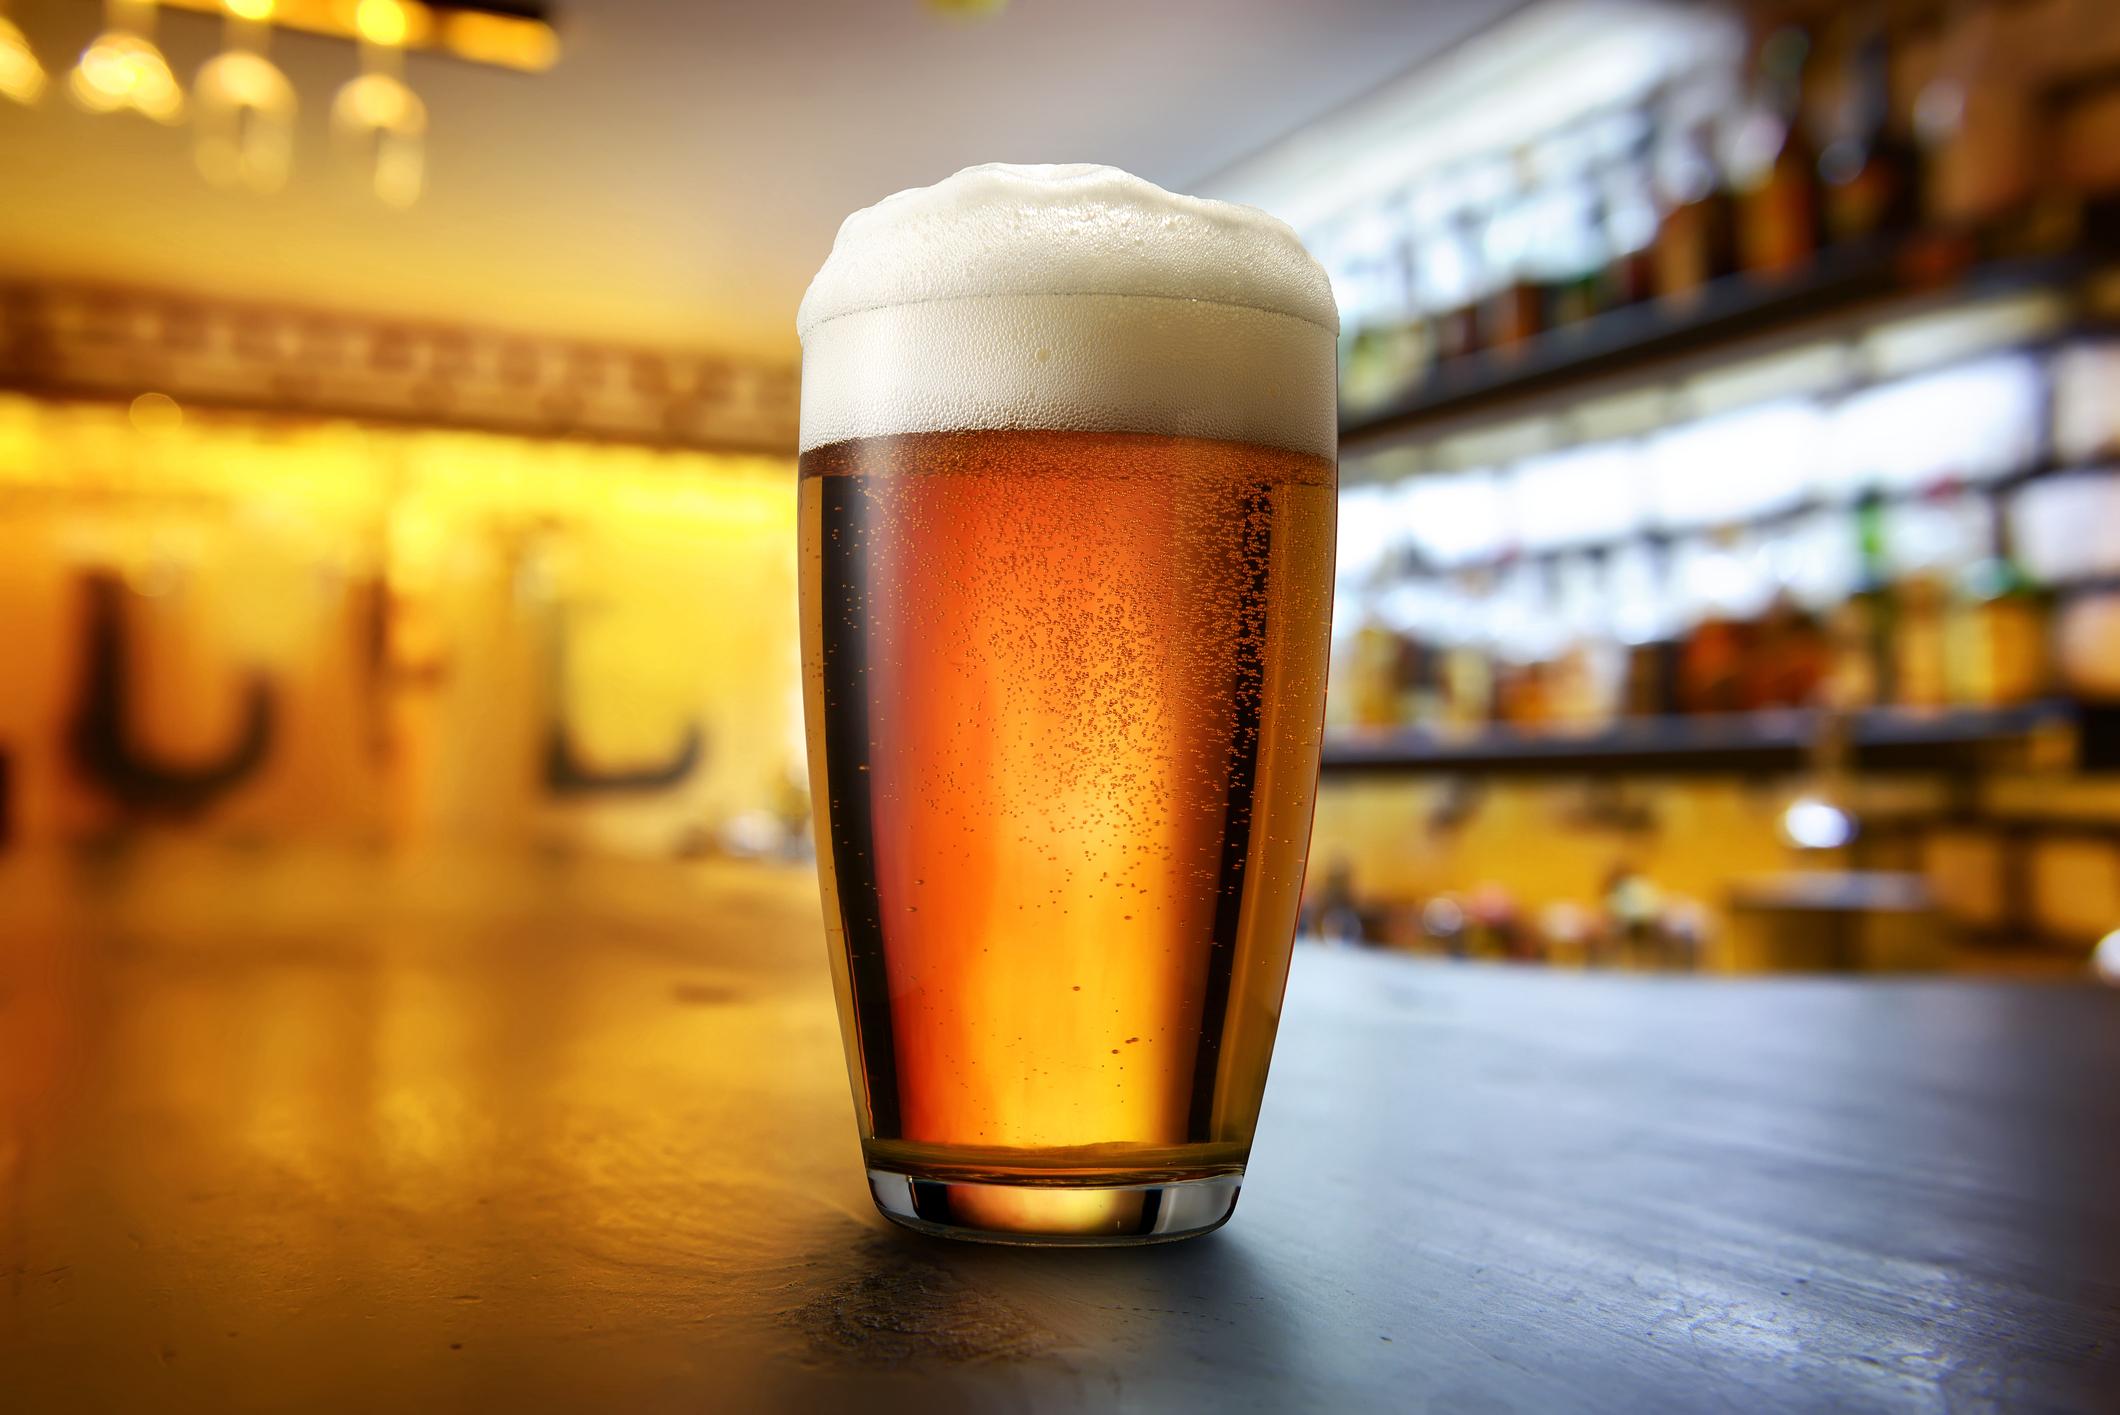 Single beer glass on a bar.